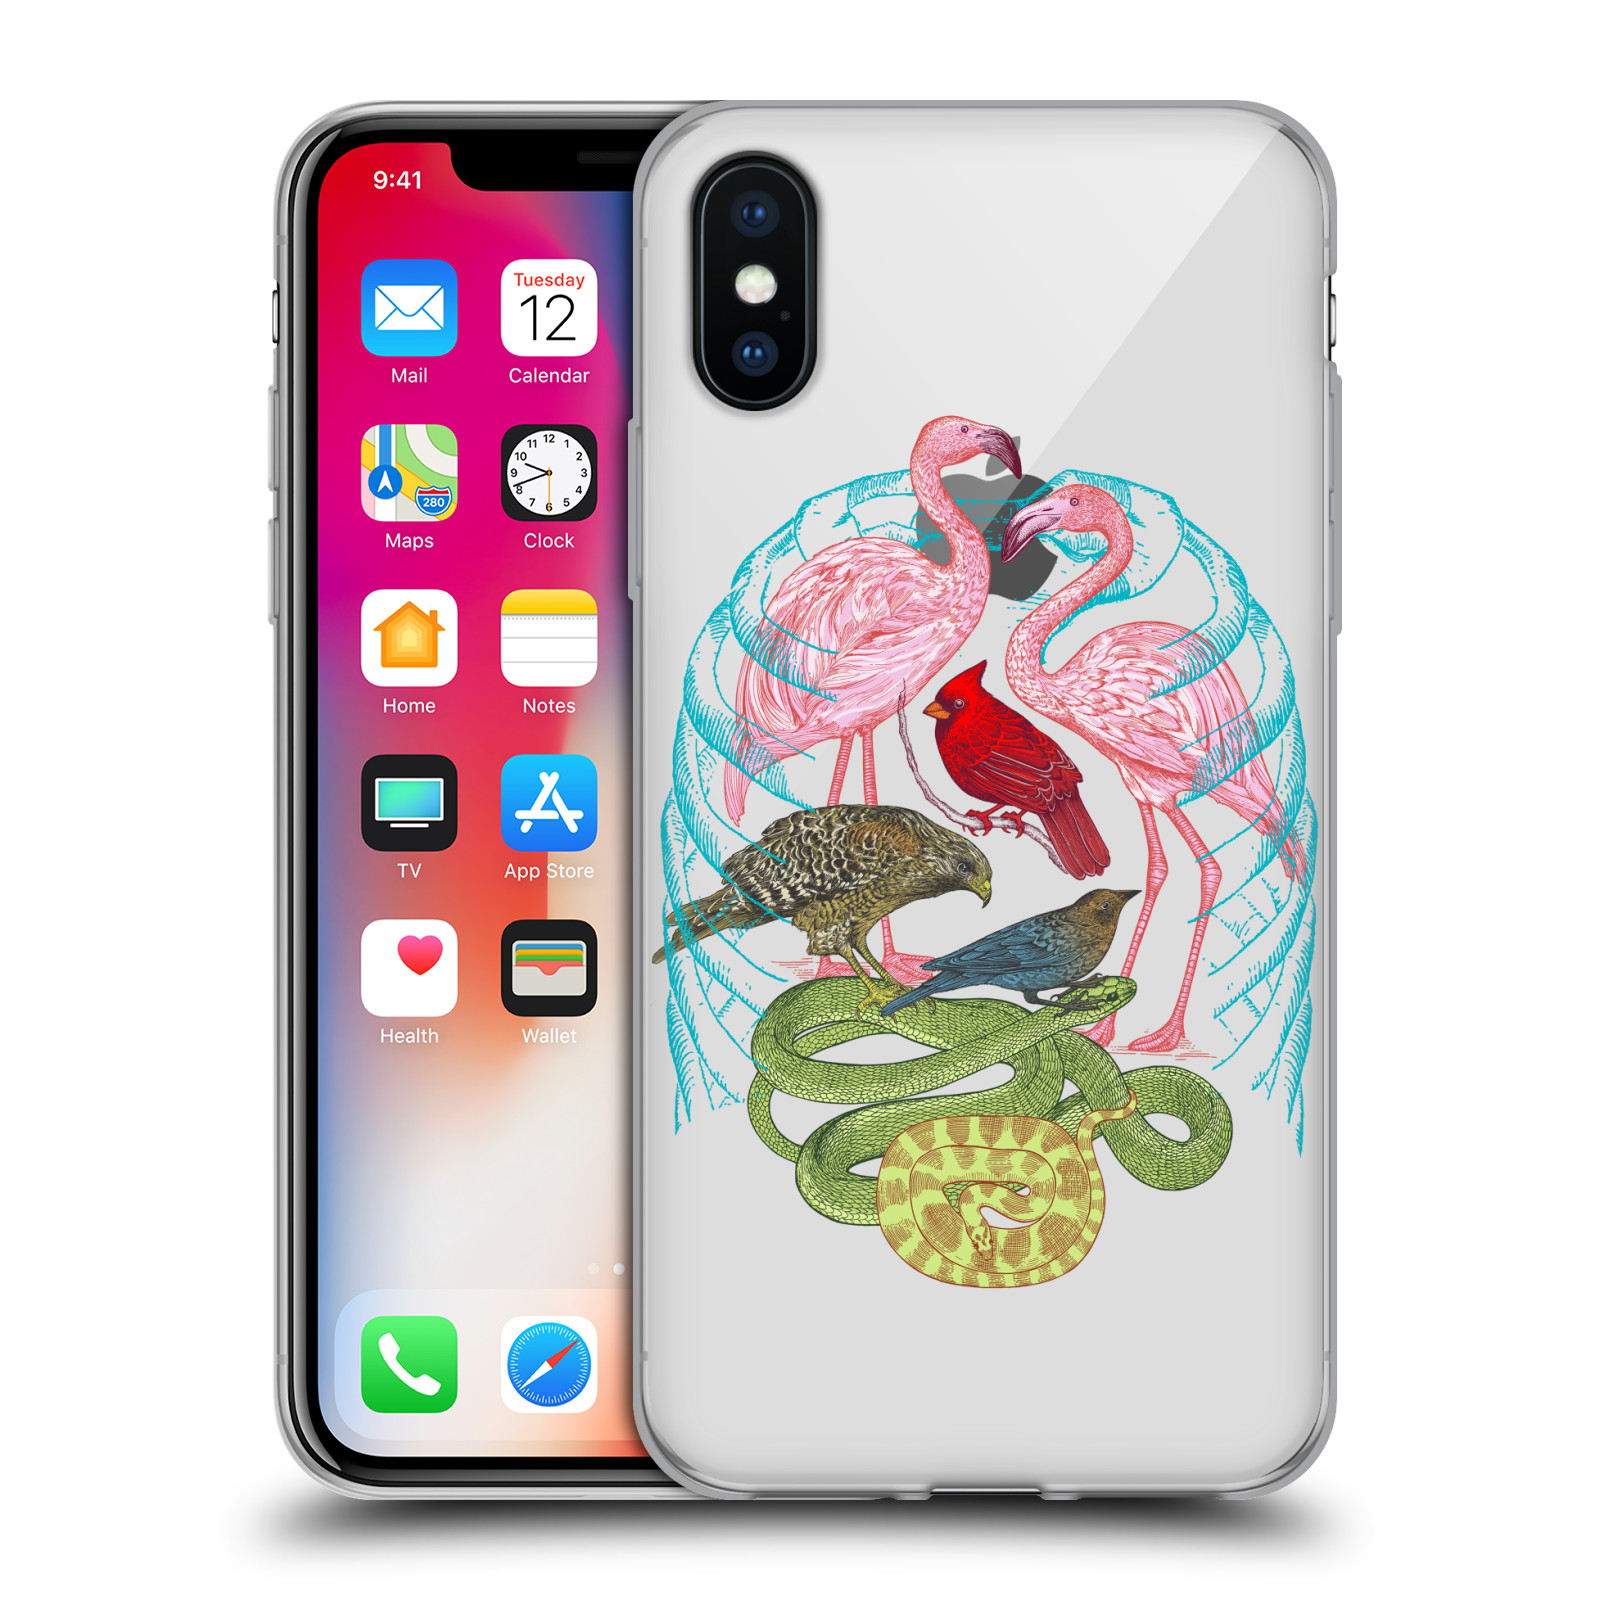 OFFICIAL-RACHEL-CALDWELL-ANATOMY-SOFT-GEL-CASE-FOR-APPLE-iPHONE-PHONES